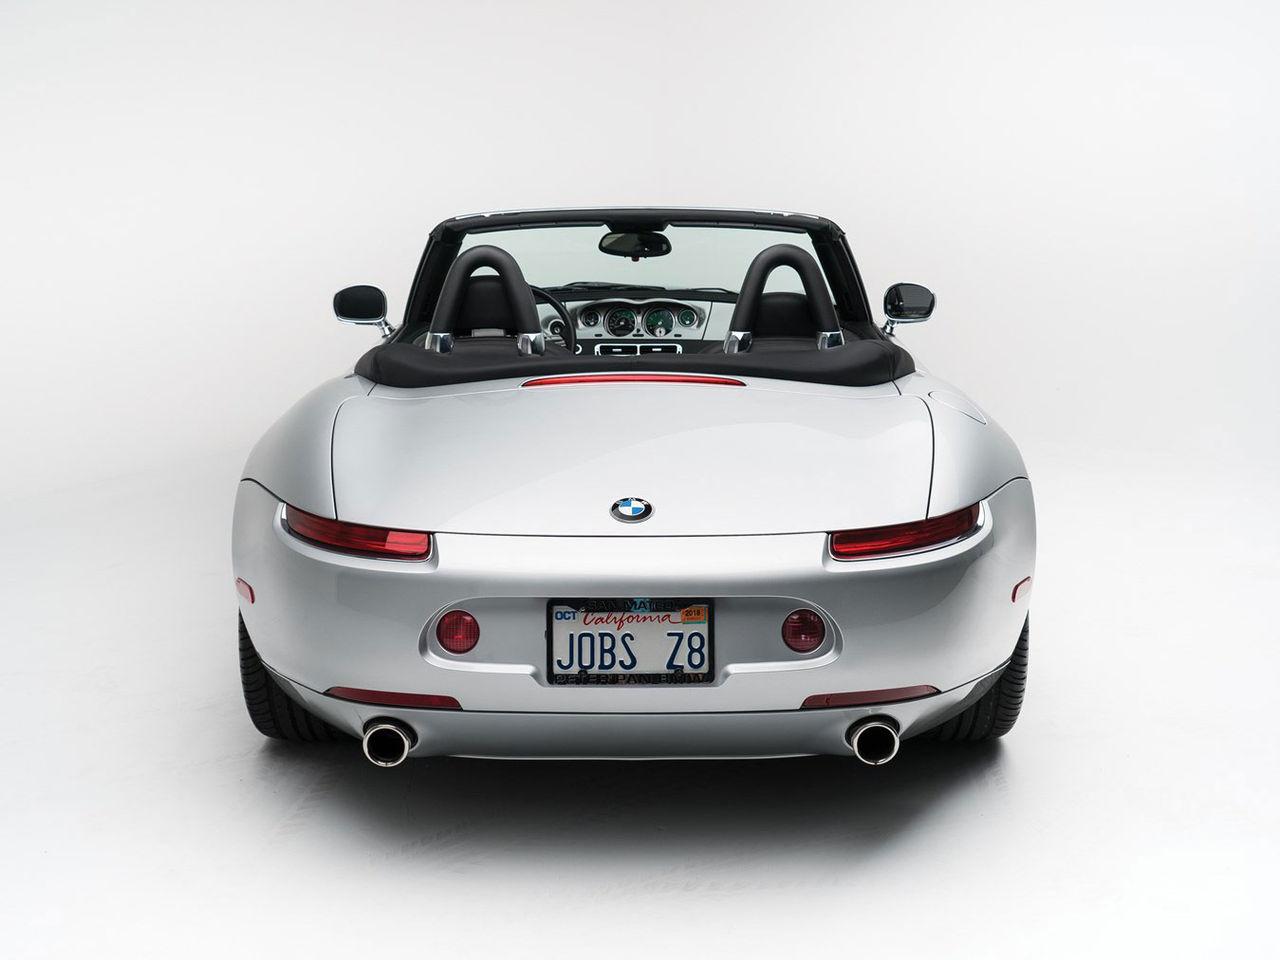 Köp Steve Jobs gamla BMW Z8